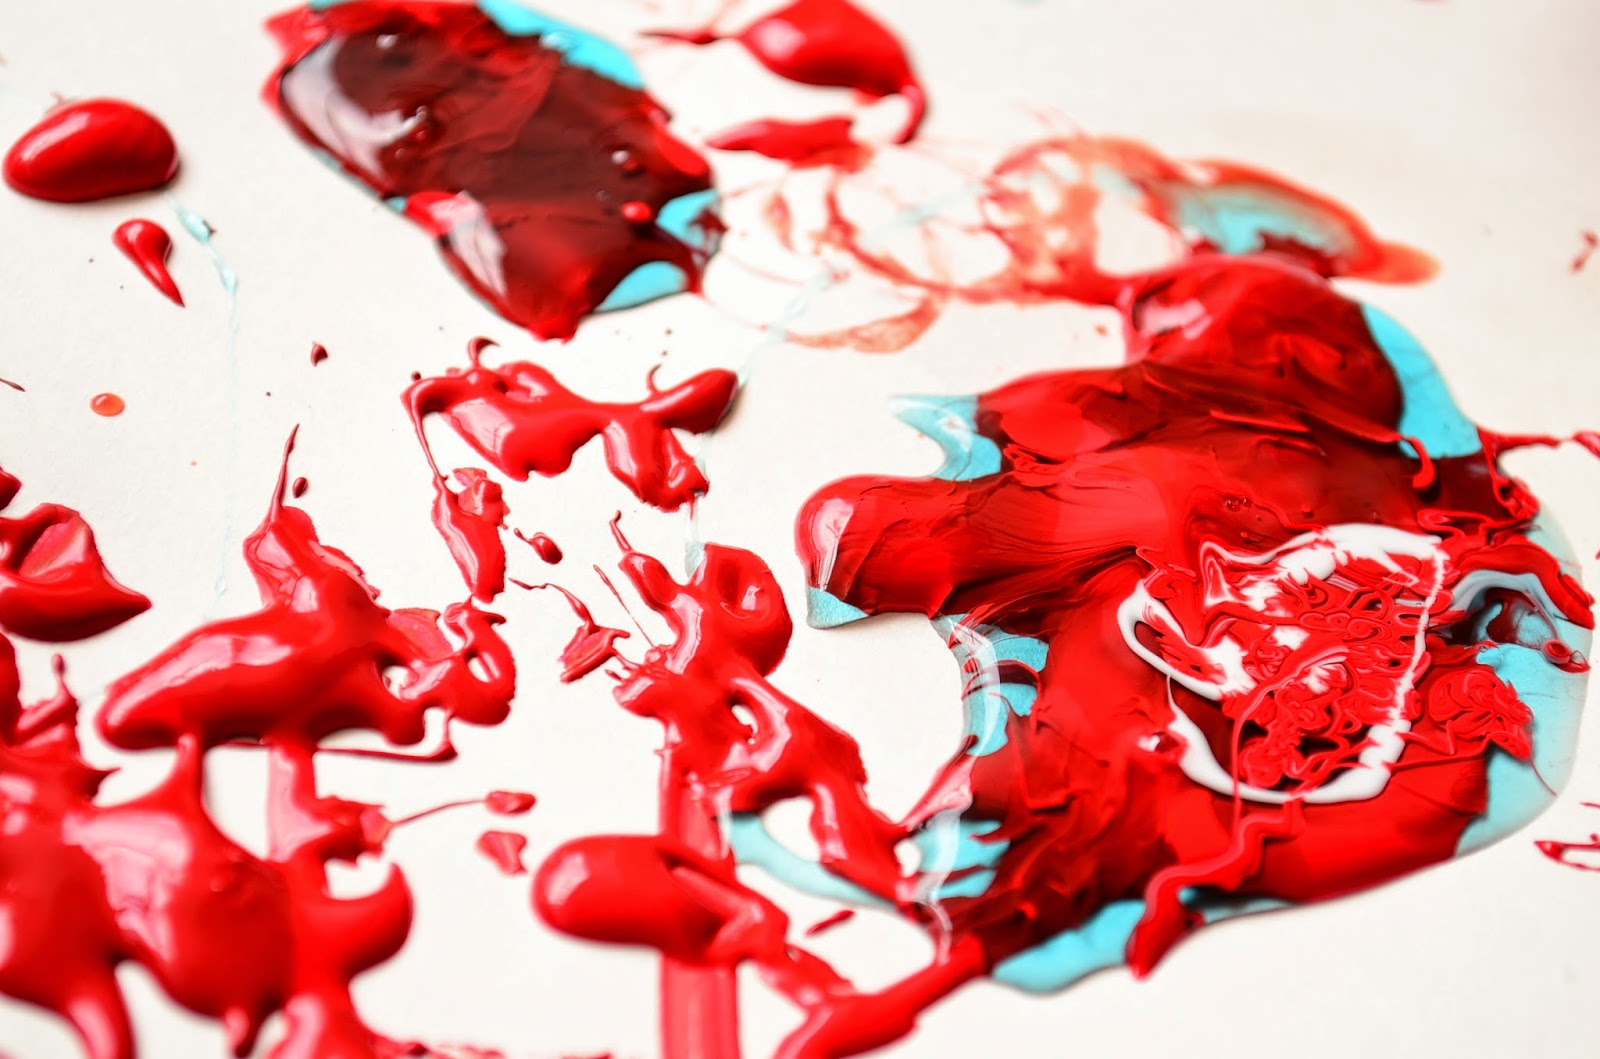 13 Non-Traditional Art Supplies for Preschoolers: Process Art, Exploring Textures